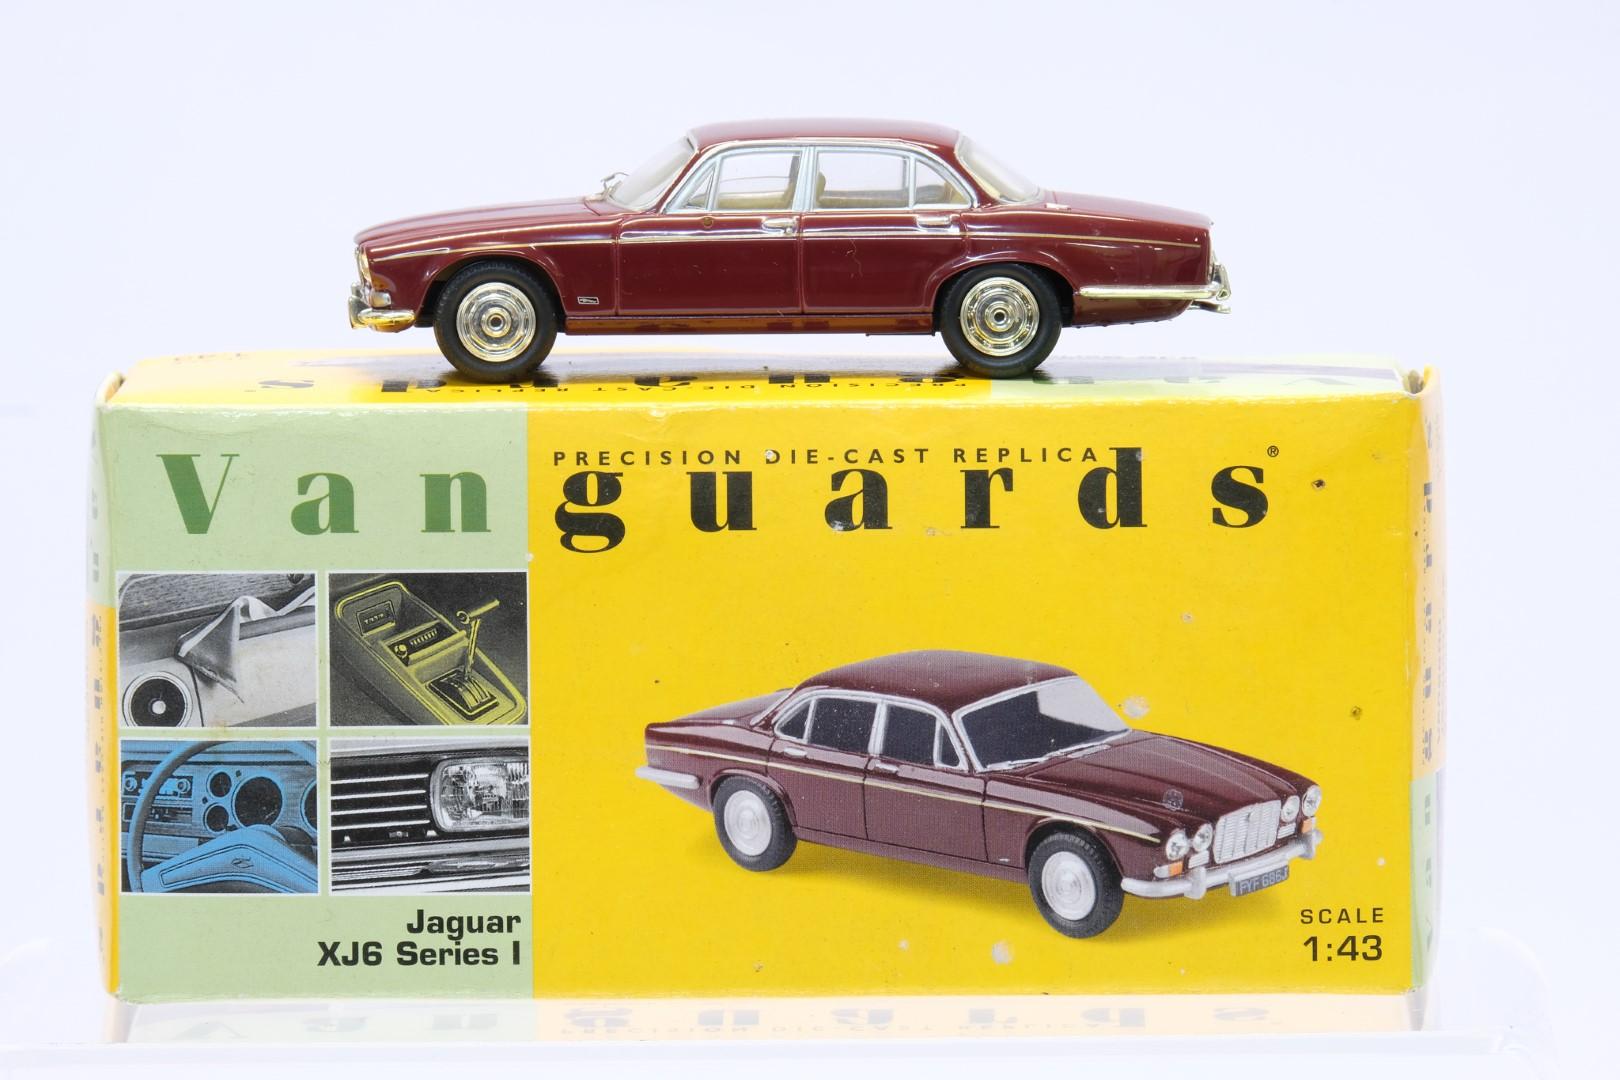 Vanguards 3 Boxed Car Models - Image 4 of 4